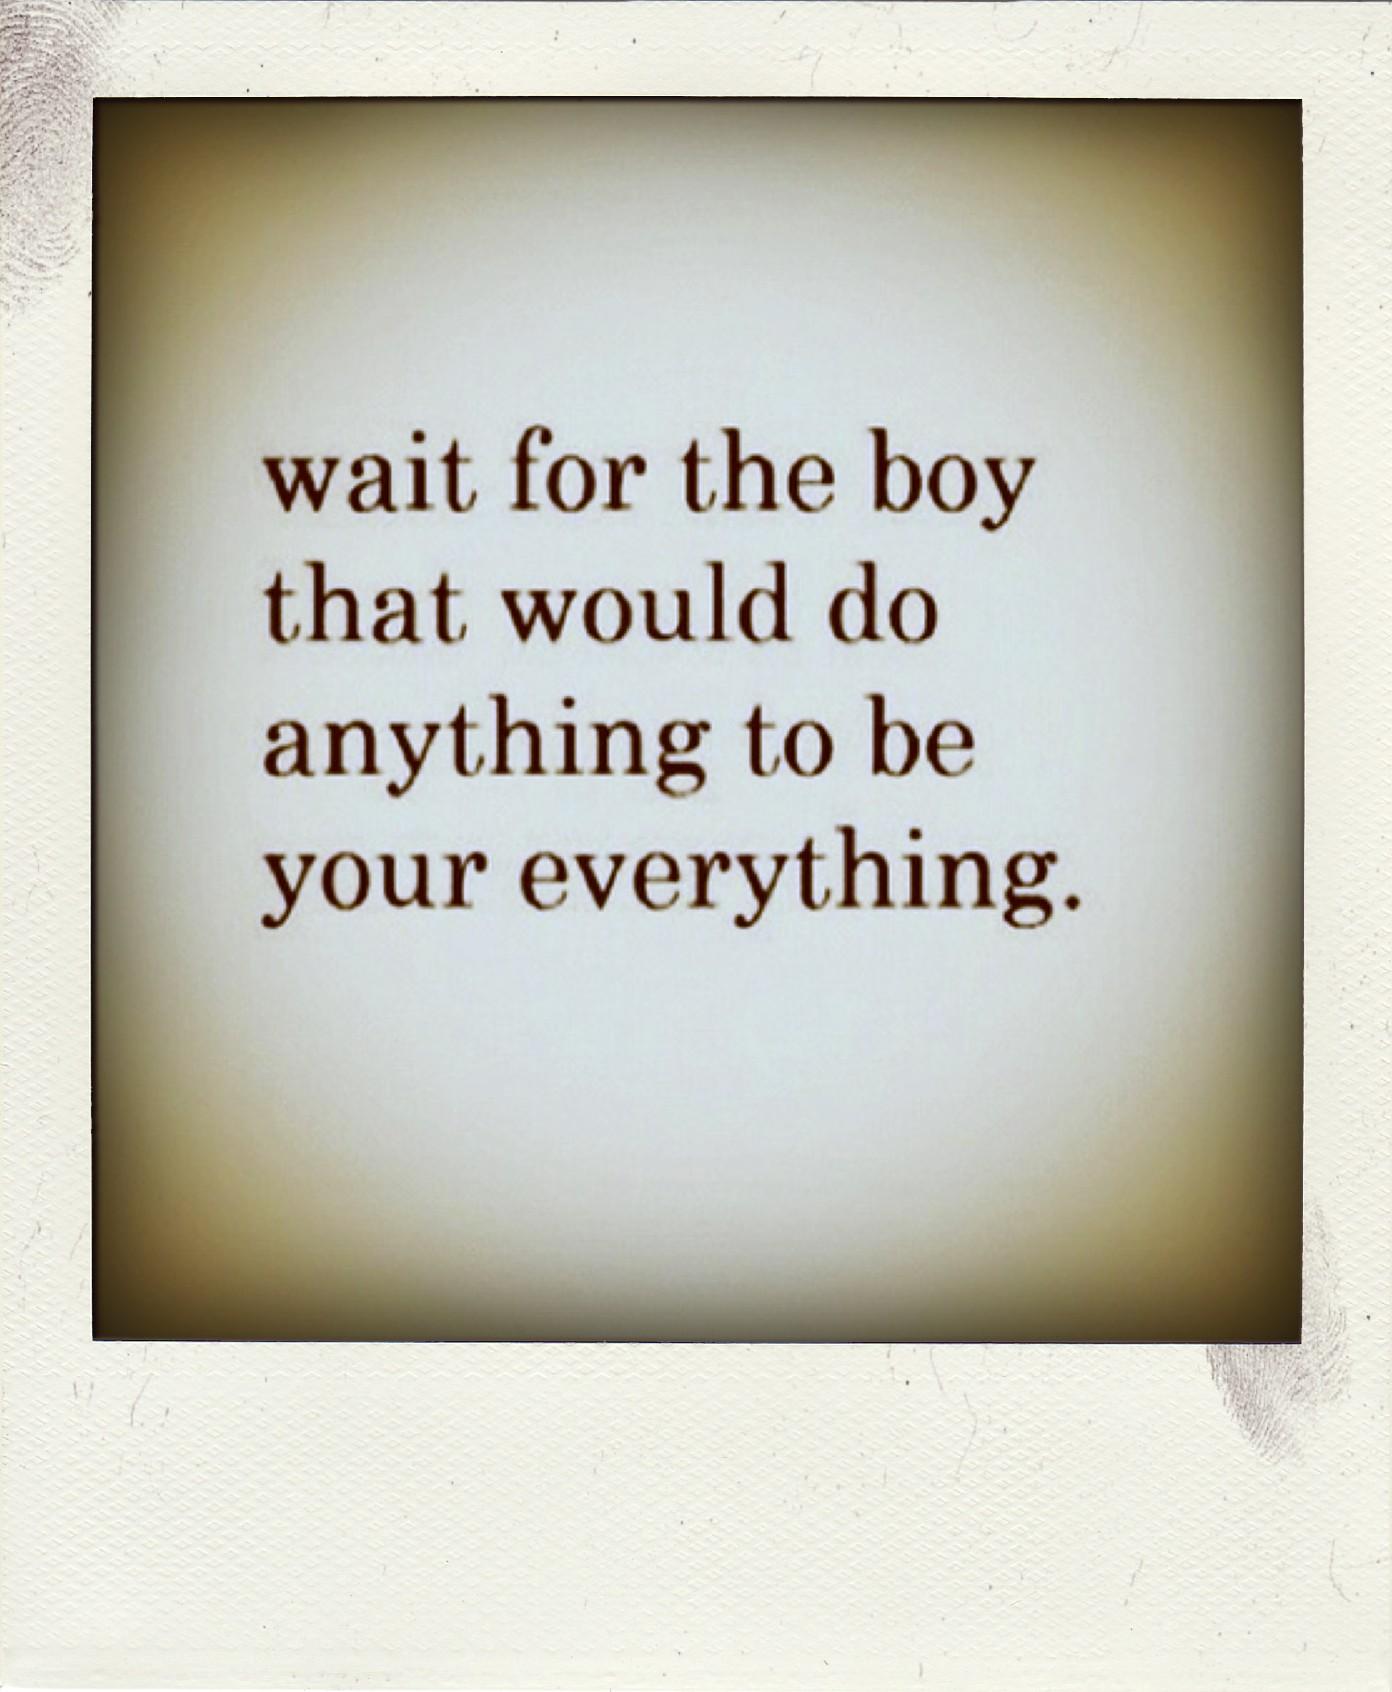 waitfortheboy-pola.jpg